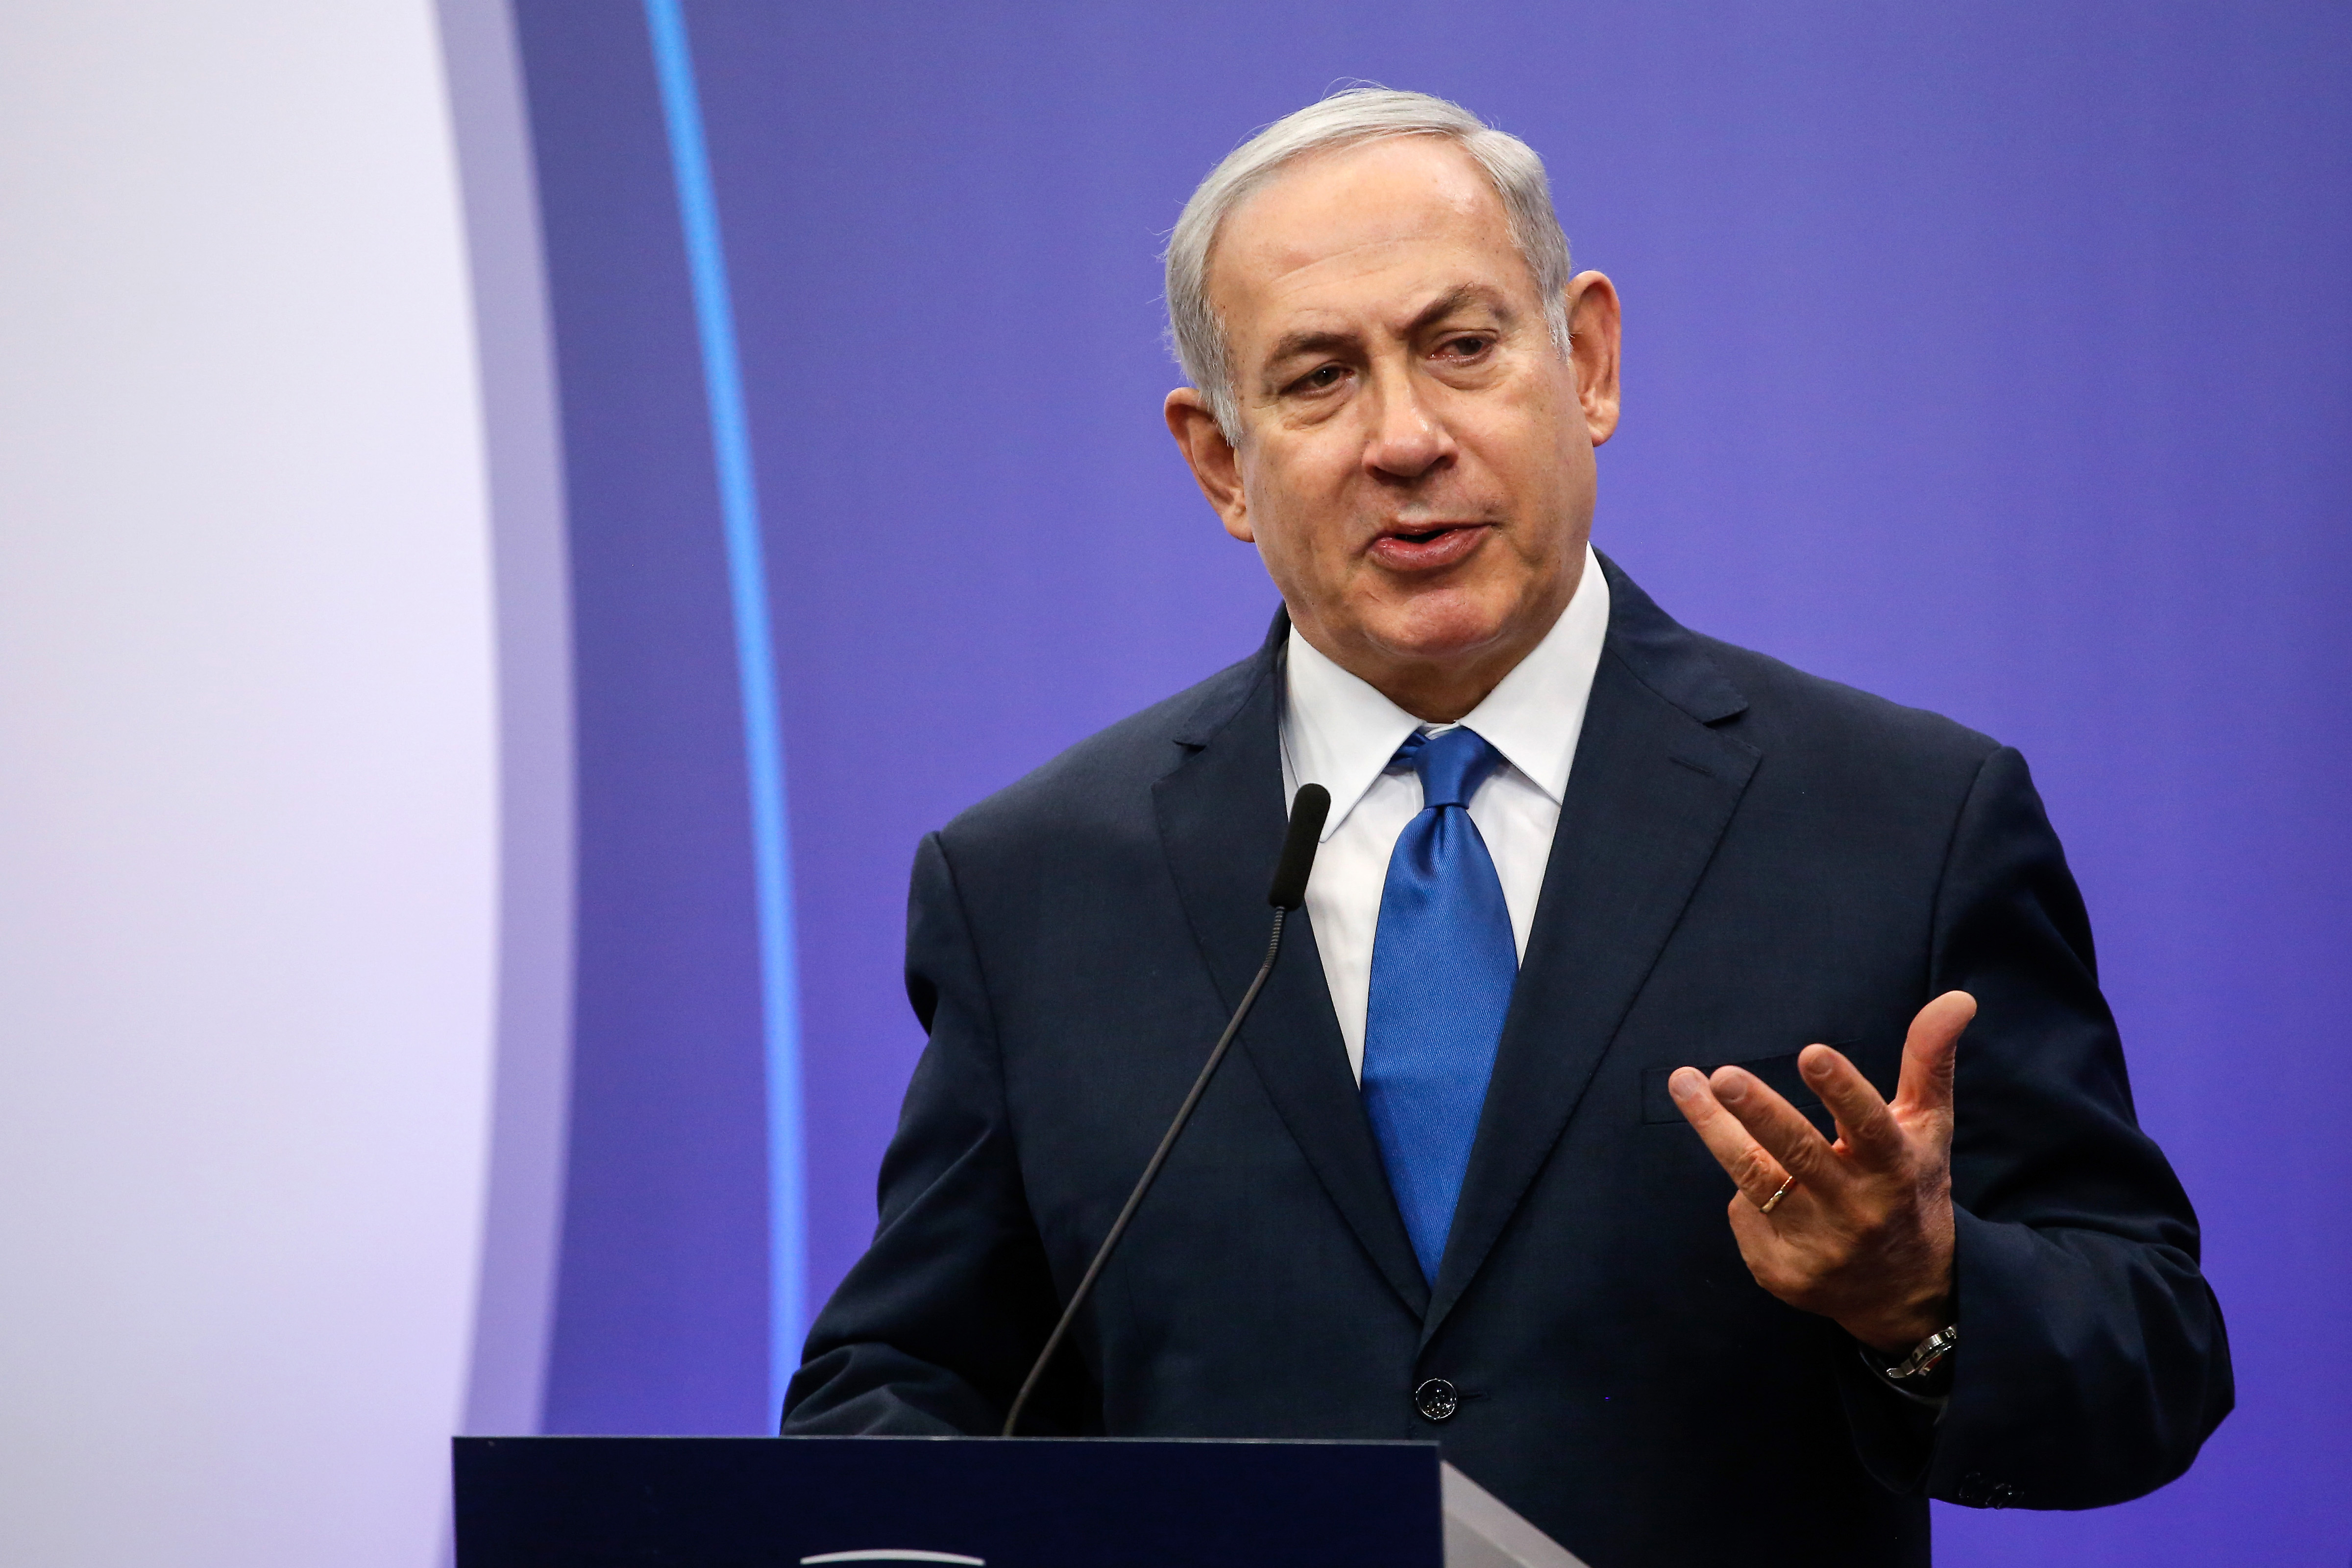 Benjamin Netanyahu, primer ministro de Israel(Bloomberg photo by Dario Pignatelli)